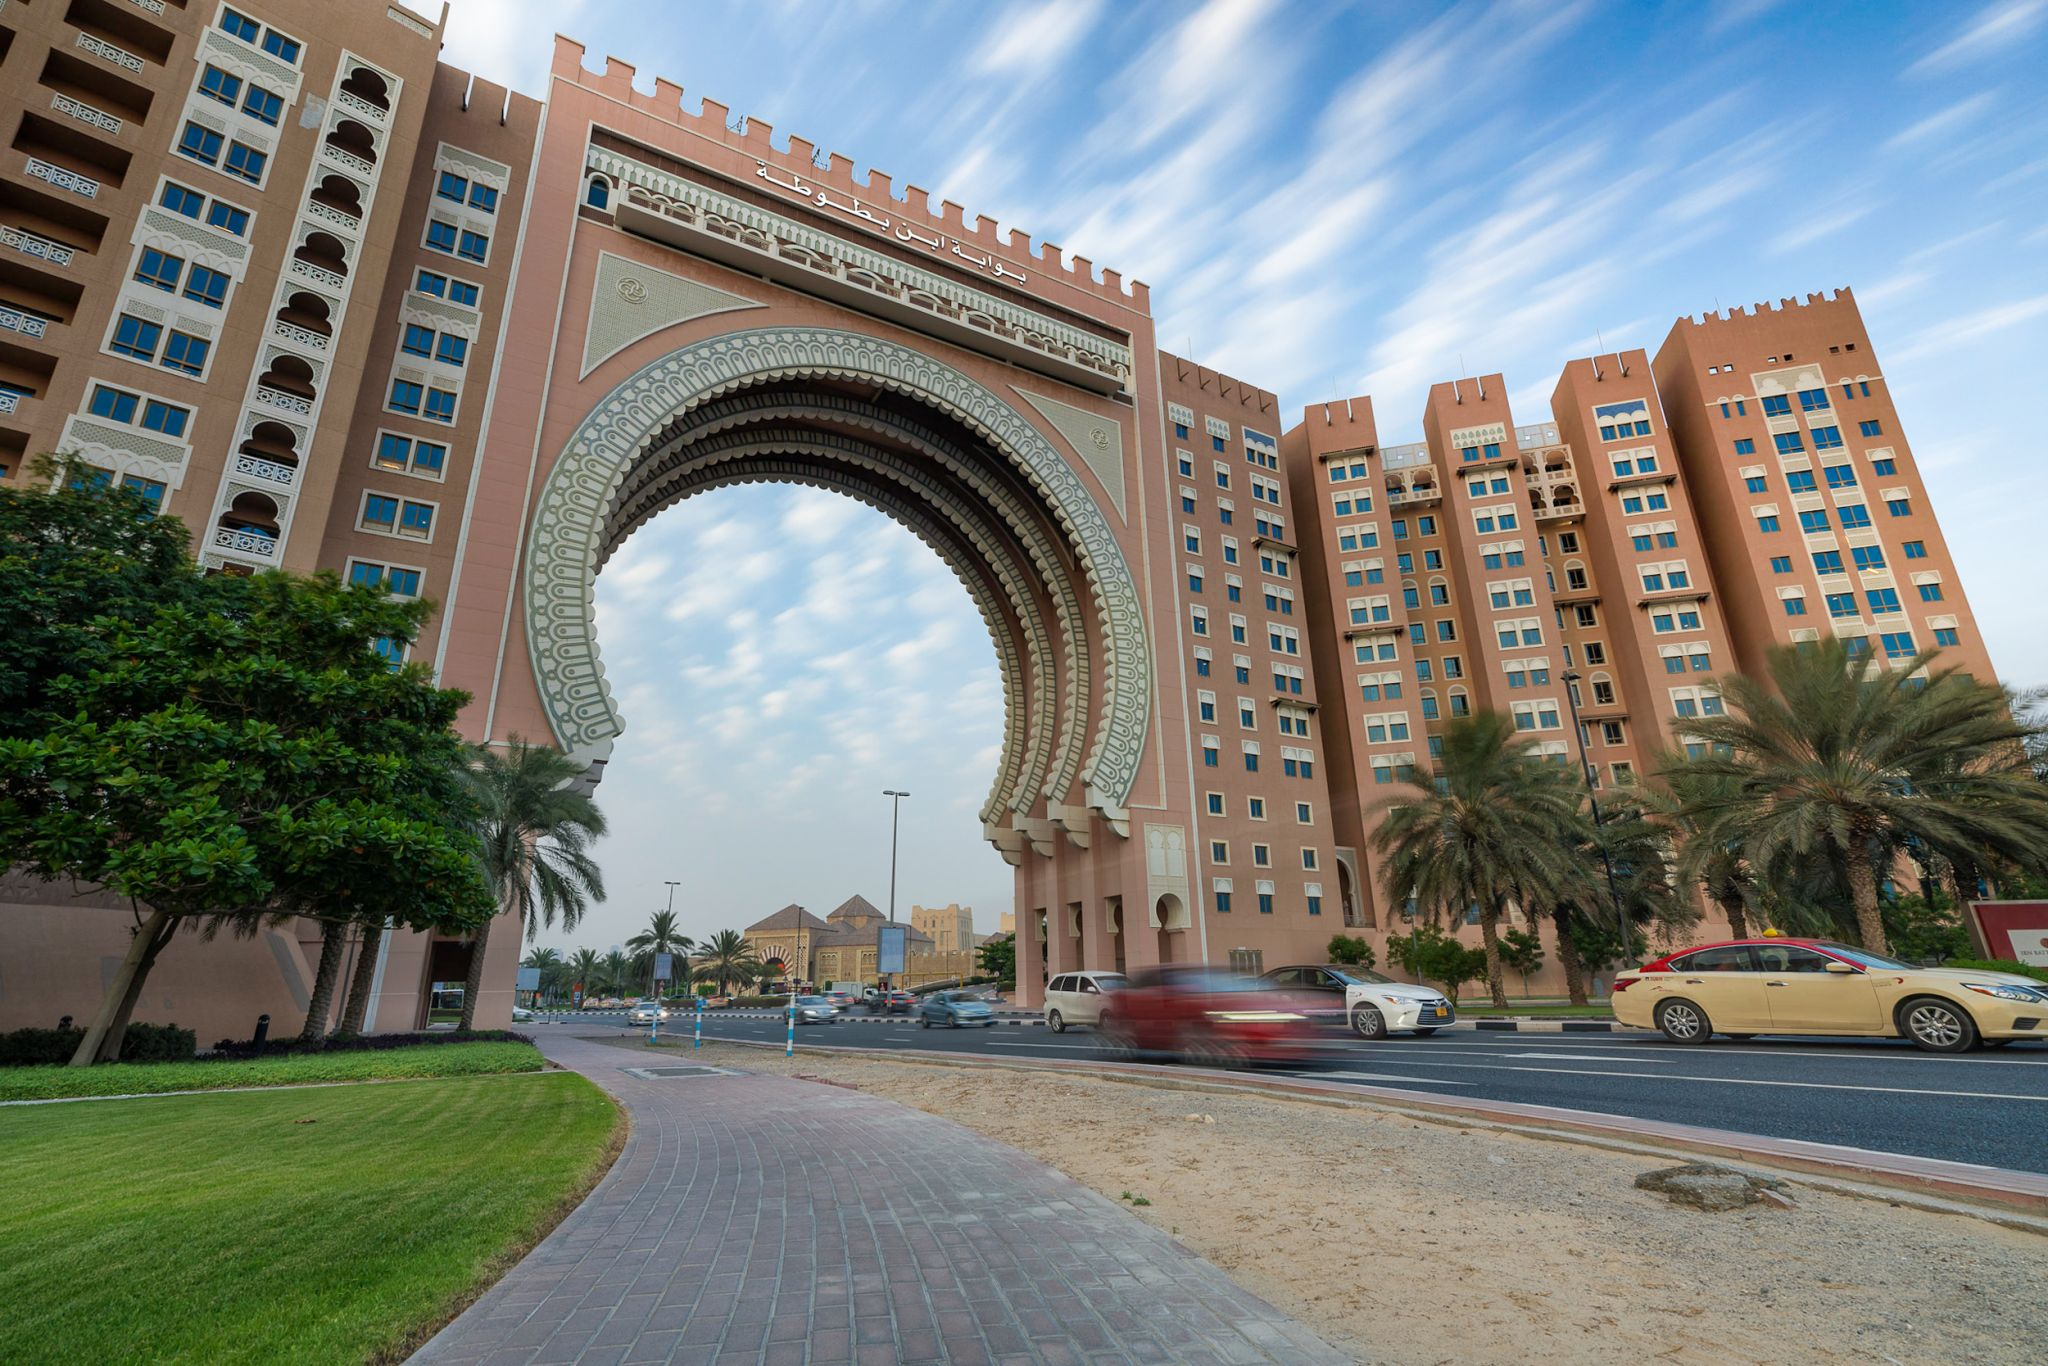 ibn battuta gate, United Arab Emirates